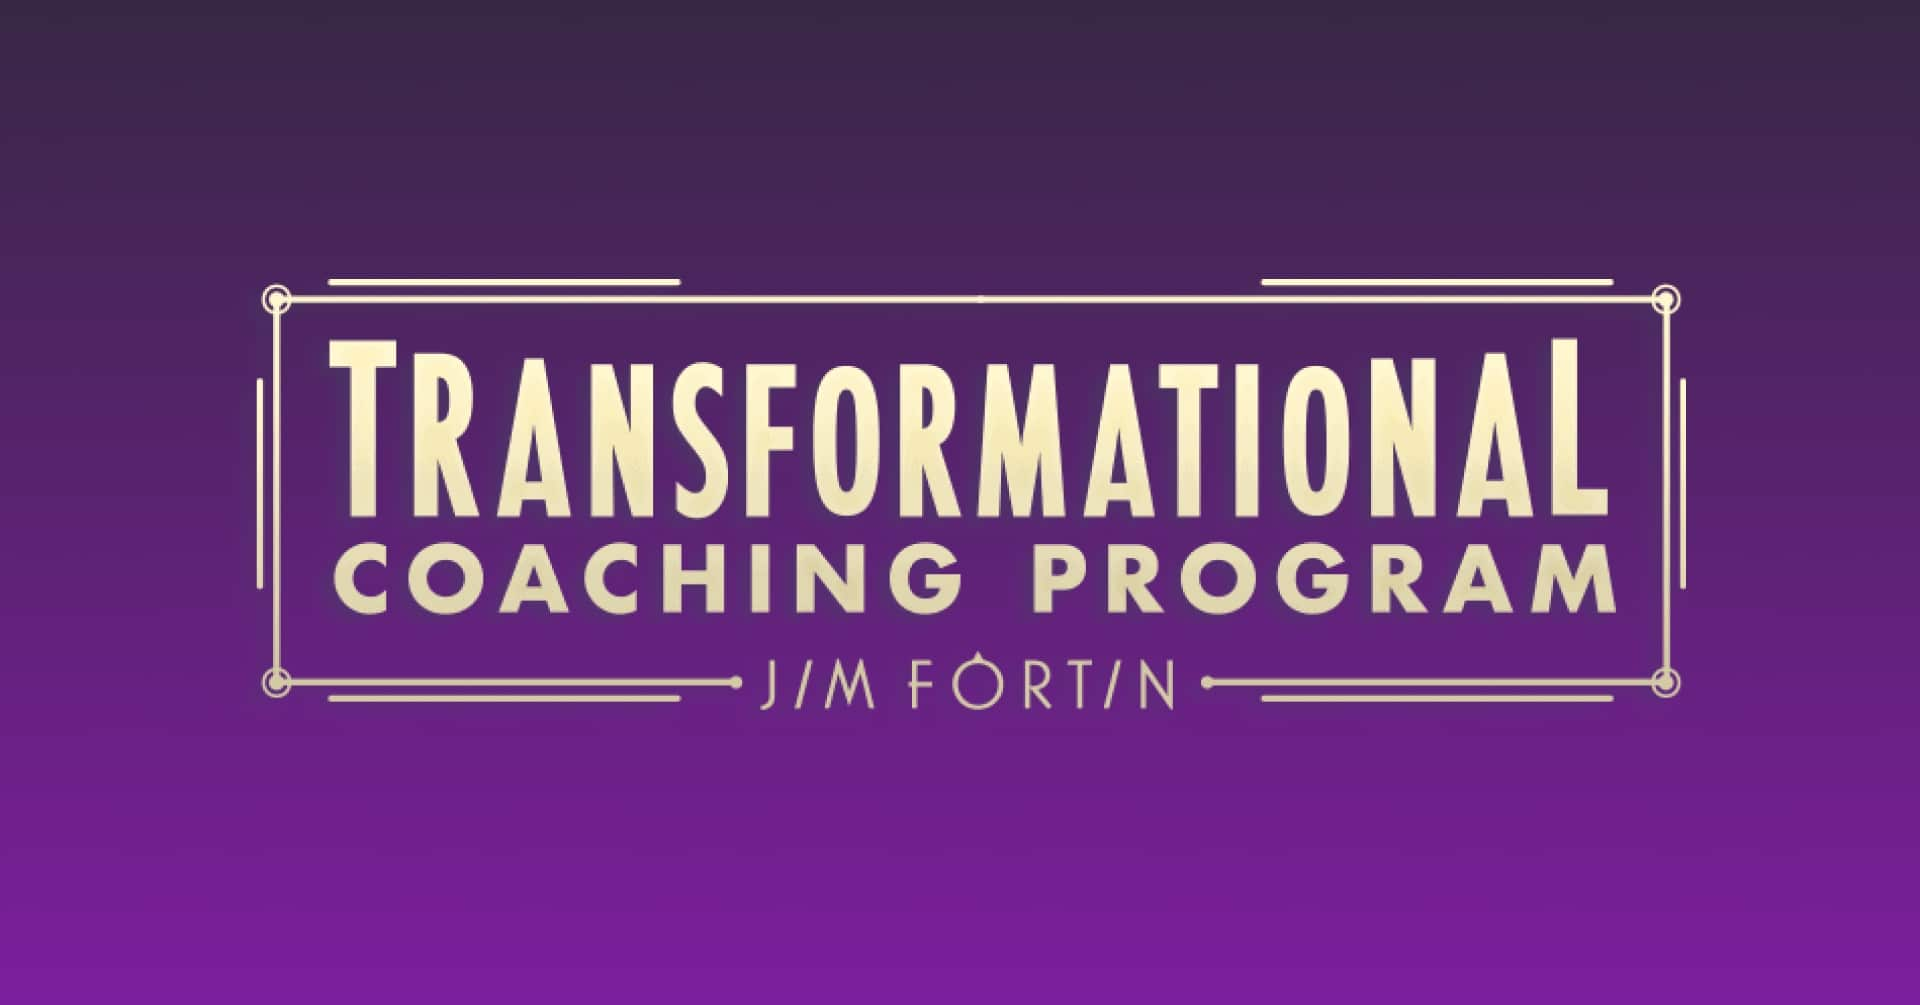 TCP coaching program banner